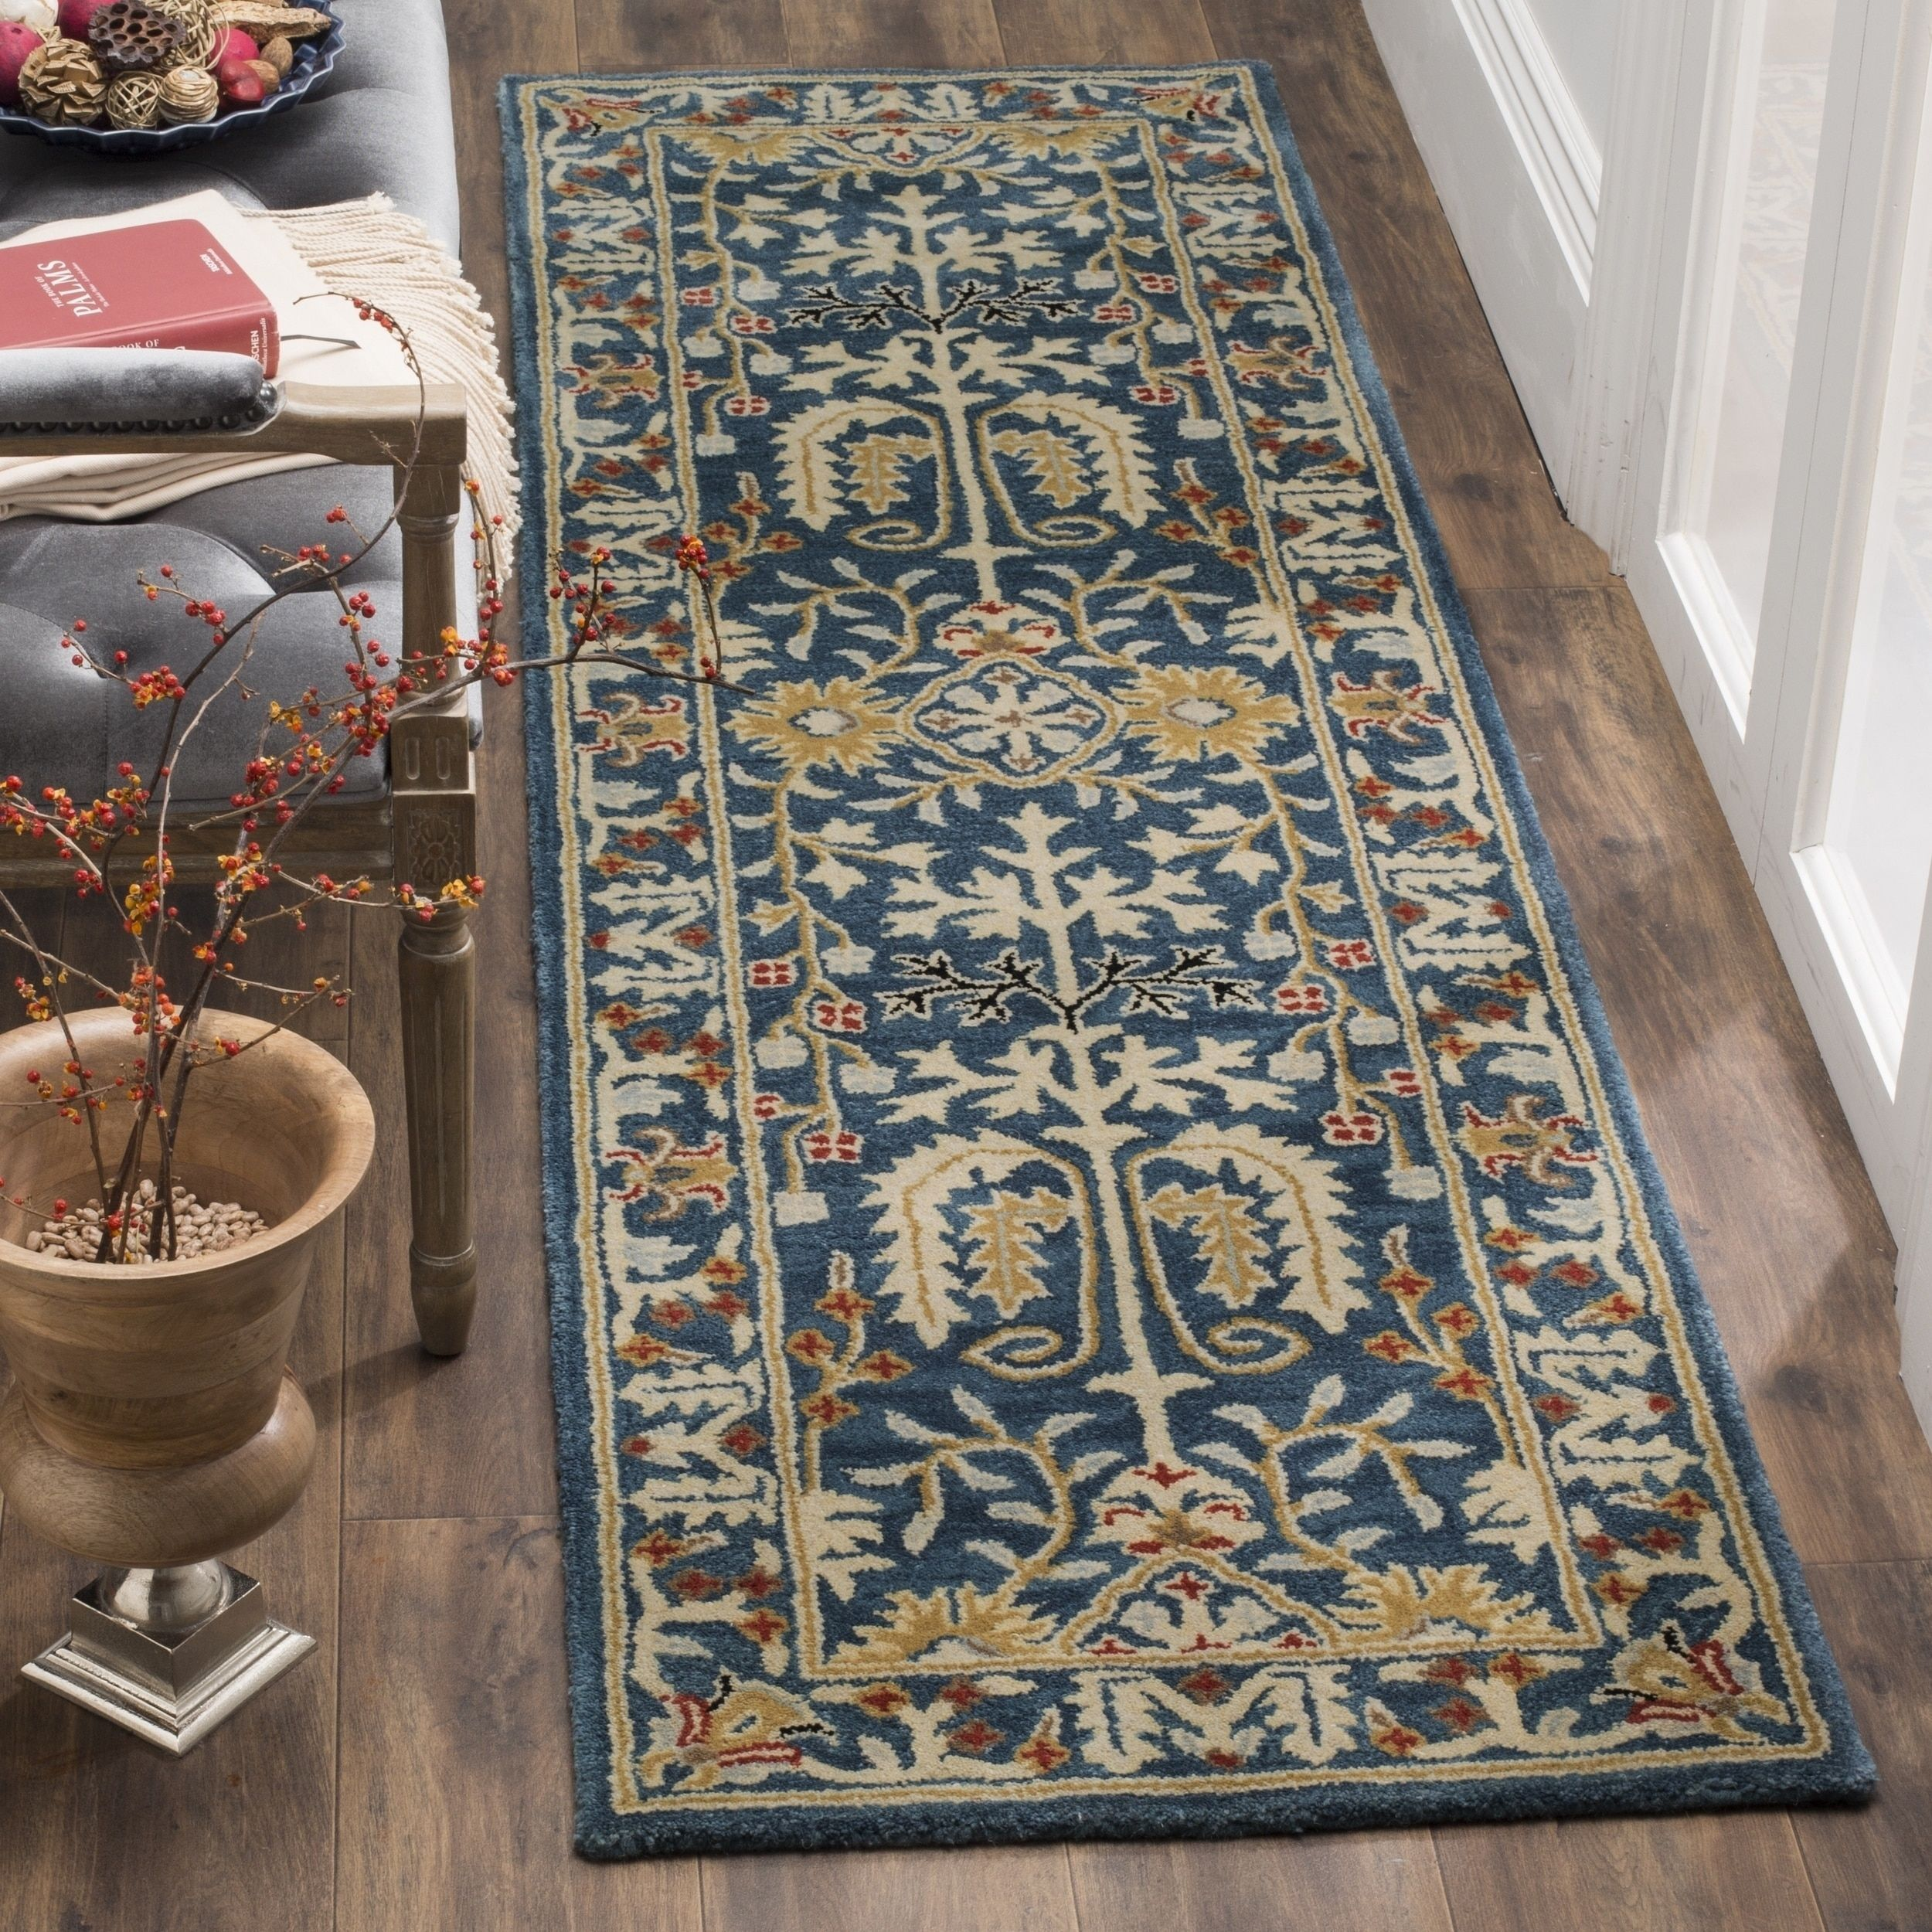 Safavieh Antiquity Hand Woven Wool Dark Blue Multi Area Rug Runner 2 3 X 12 At64b 212 Size